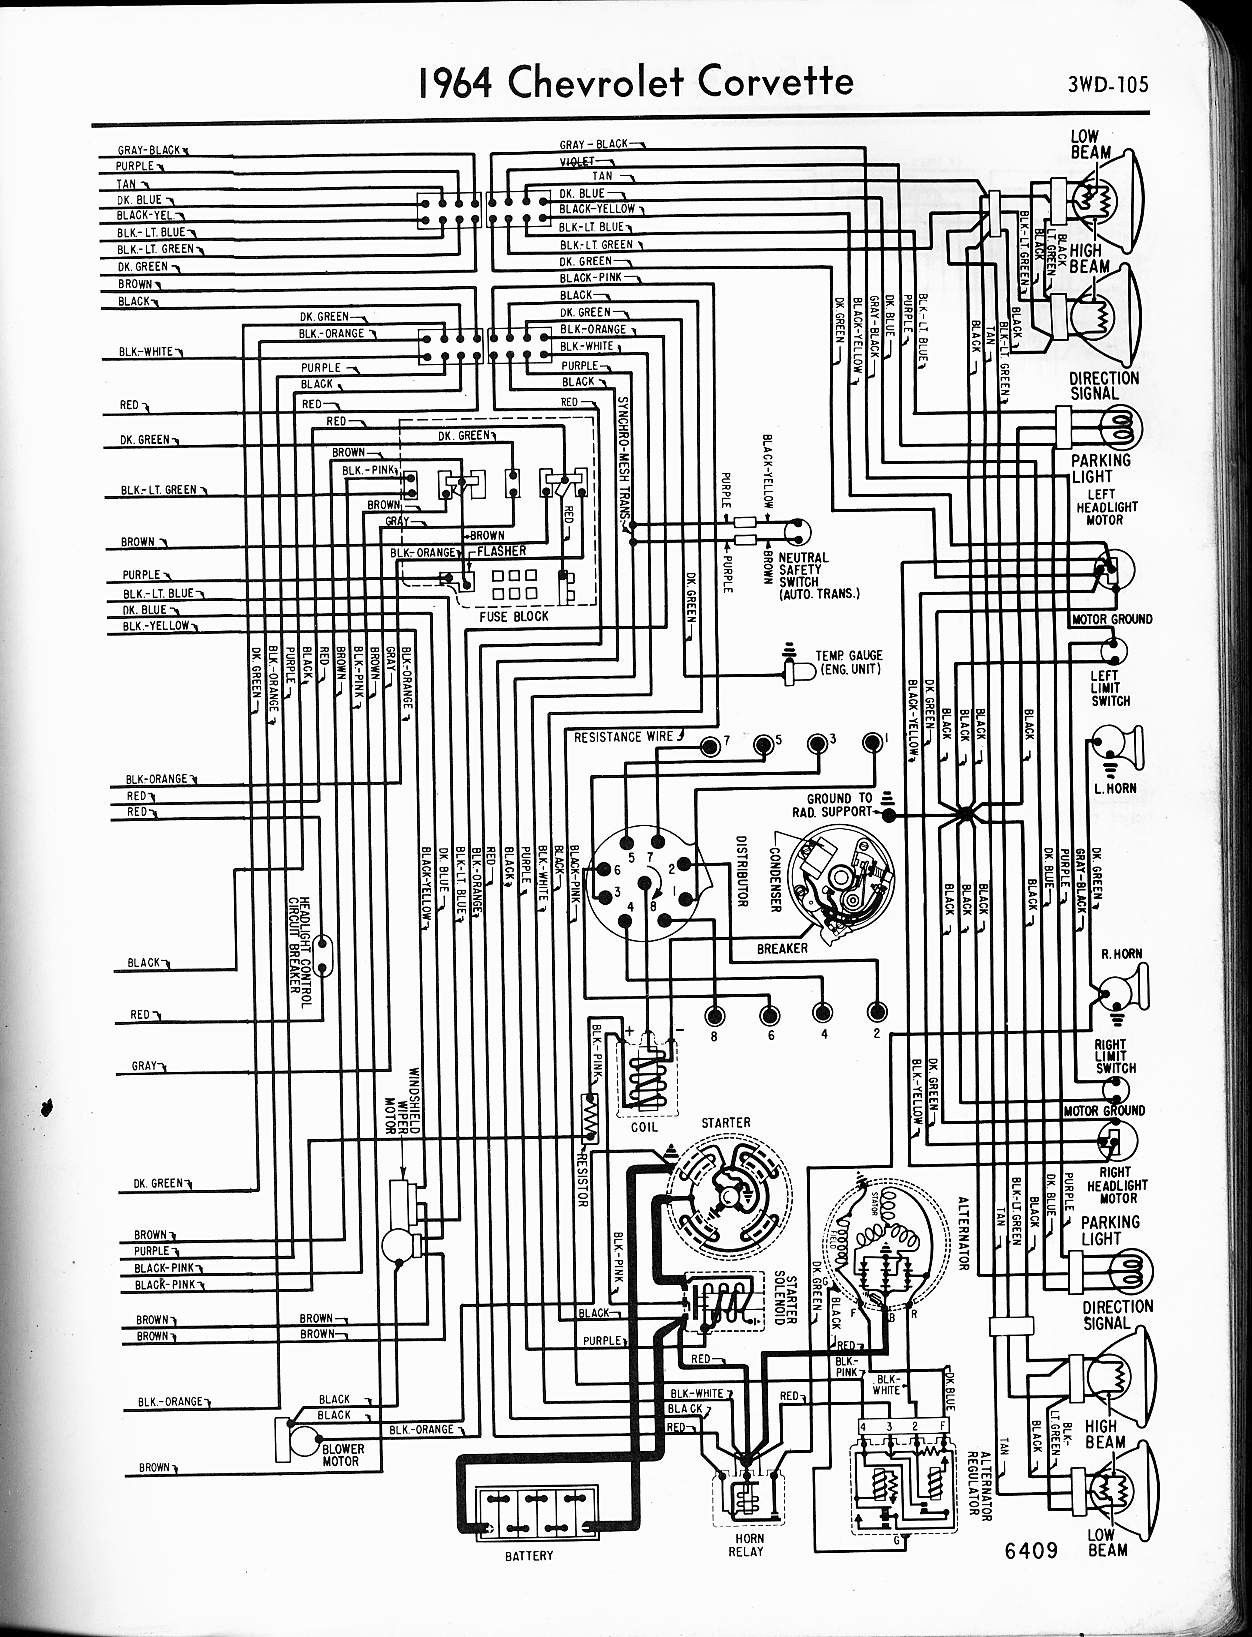 1962 chevy truck wiring diagram in 2021   chevy trucks, diagram, powerstroke  pinterest